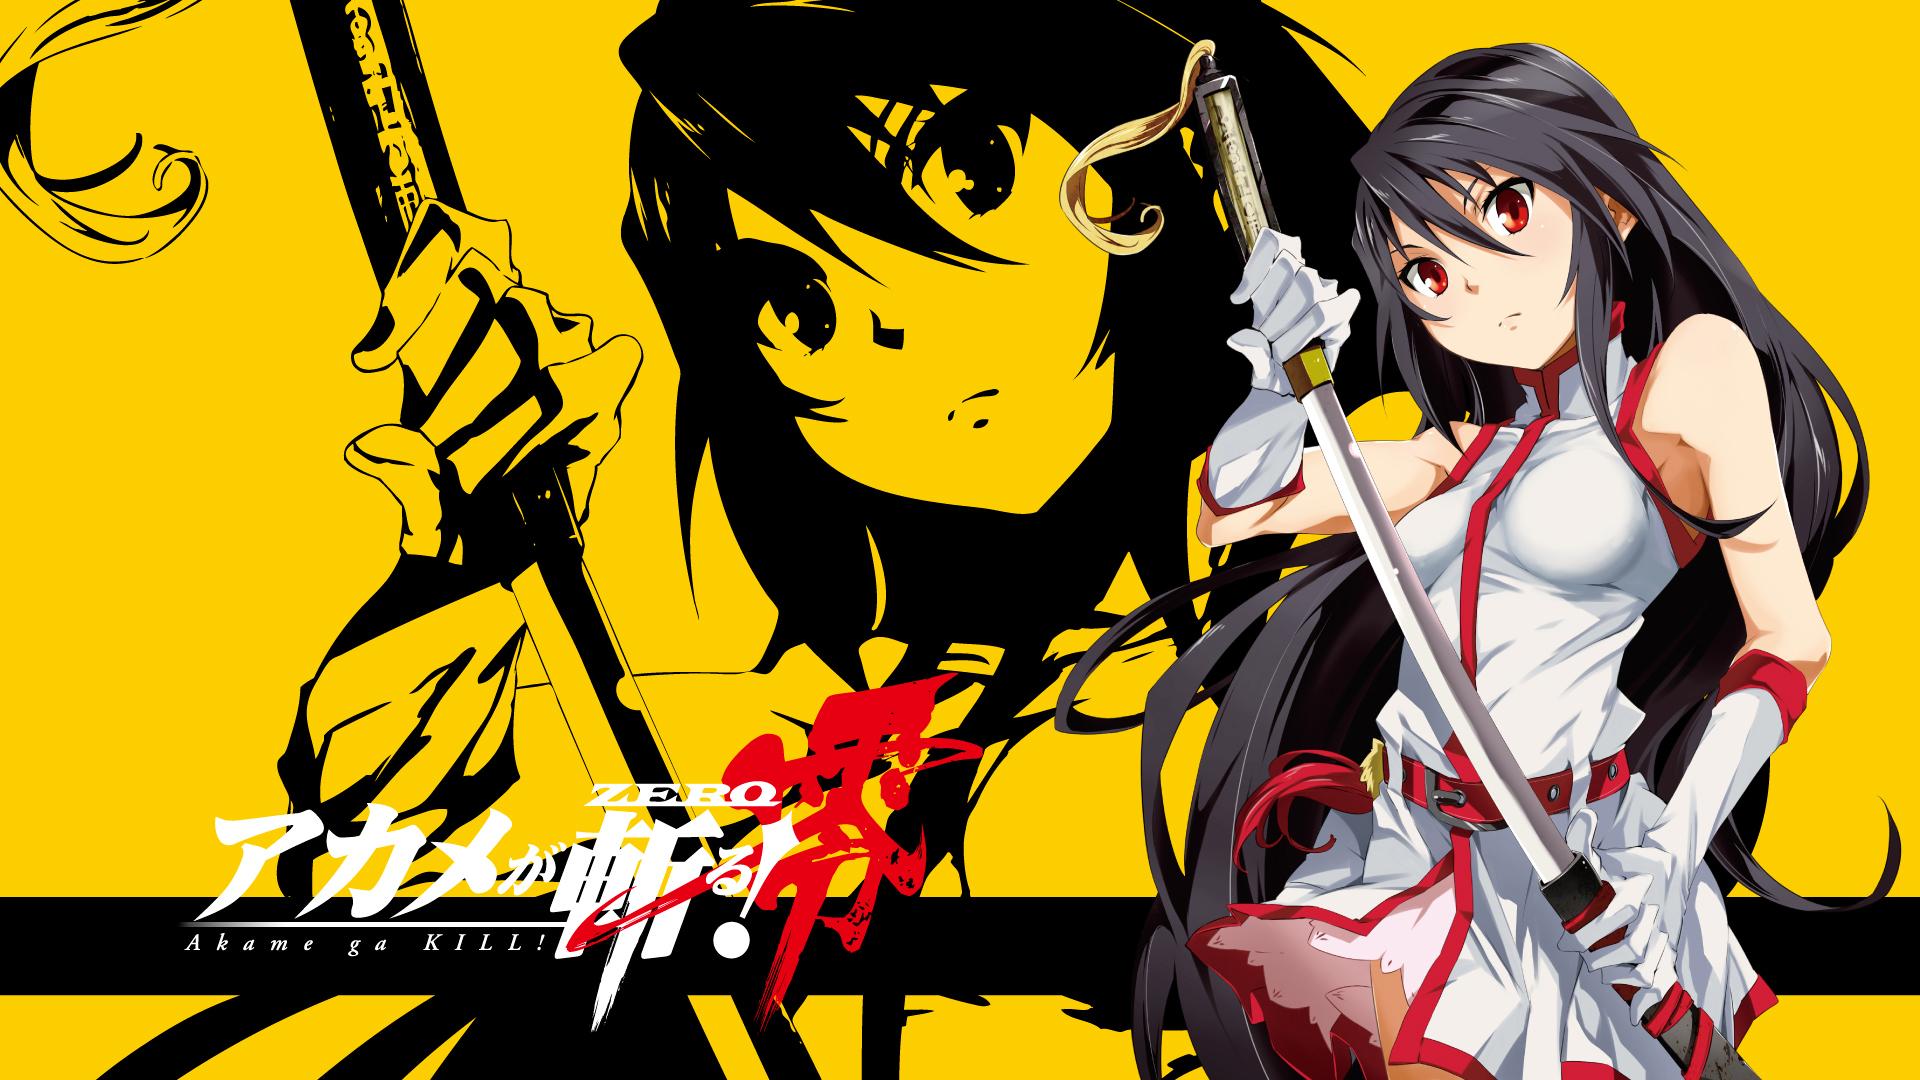 Akame Ga Kill 05 Wallpaper Hd